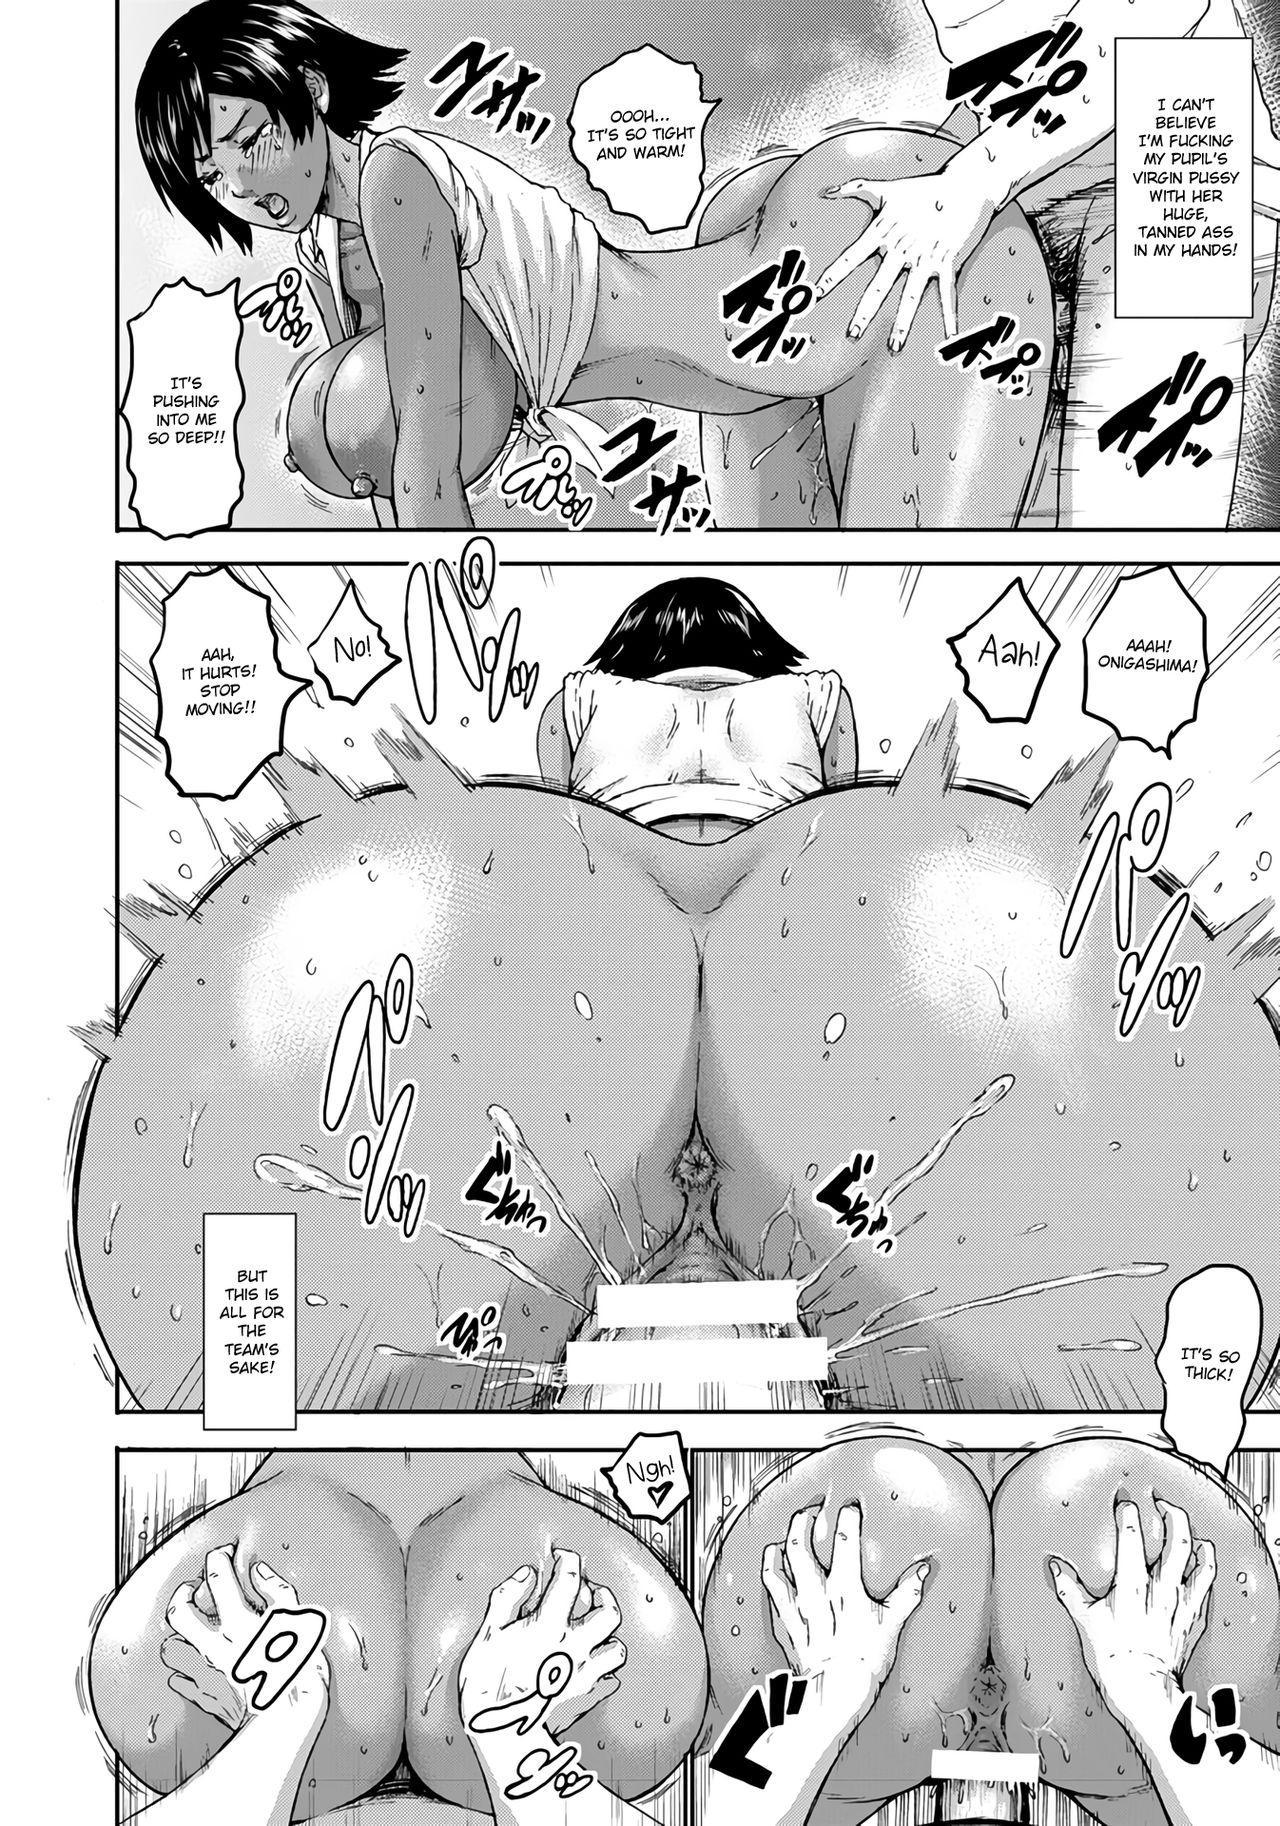 Chounyuu Gakuen | Academy For Huge Breasts 39